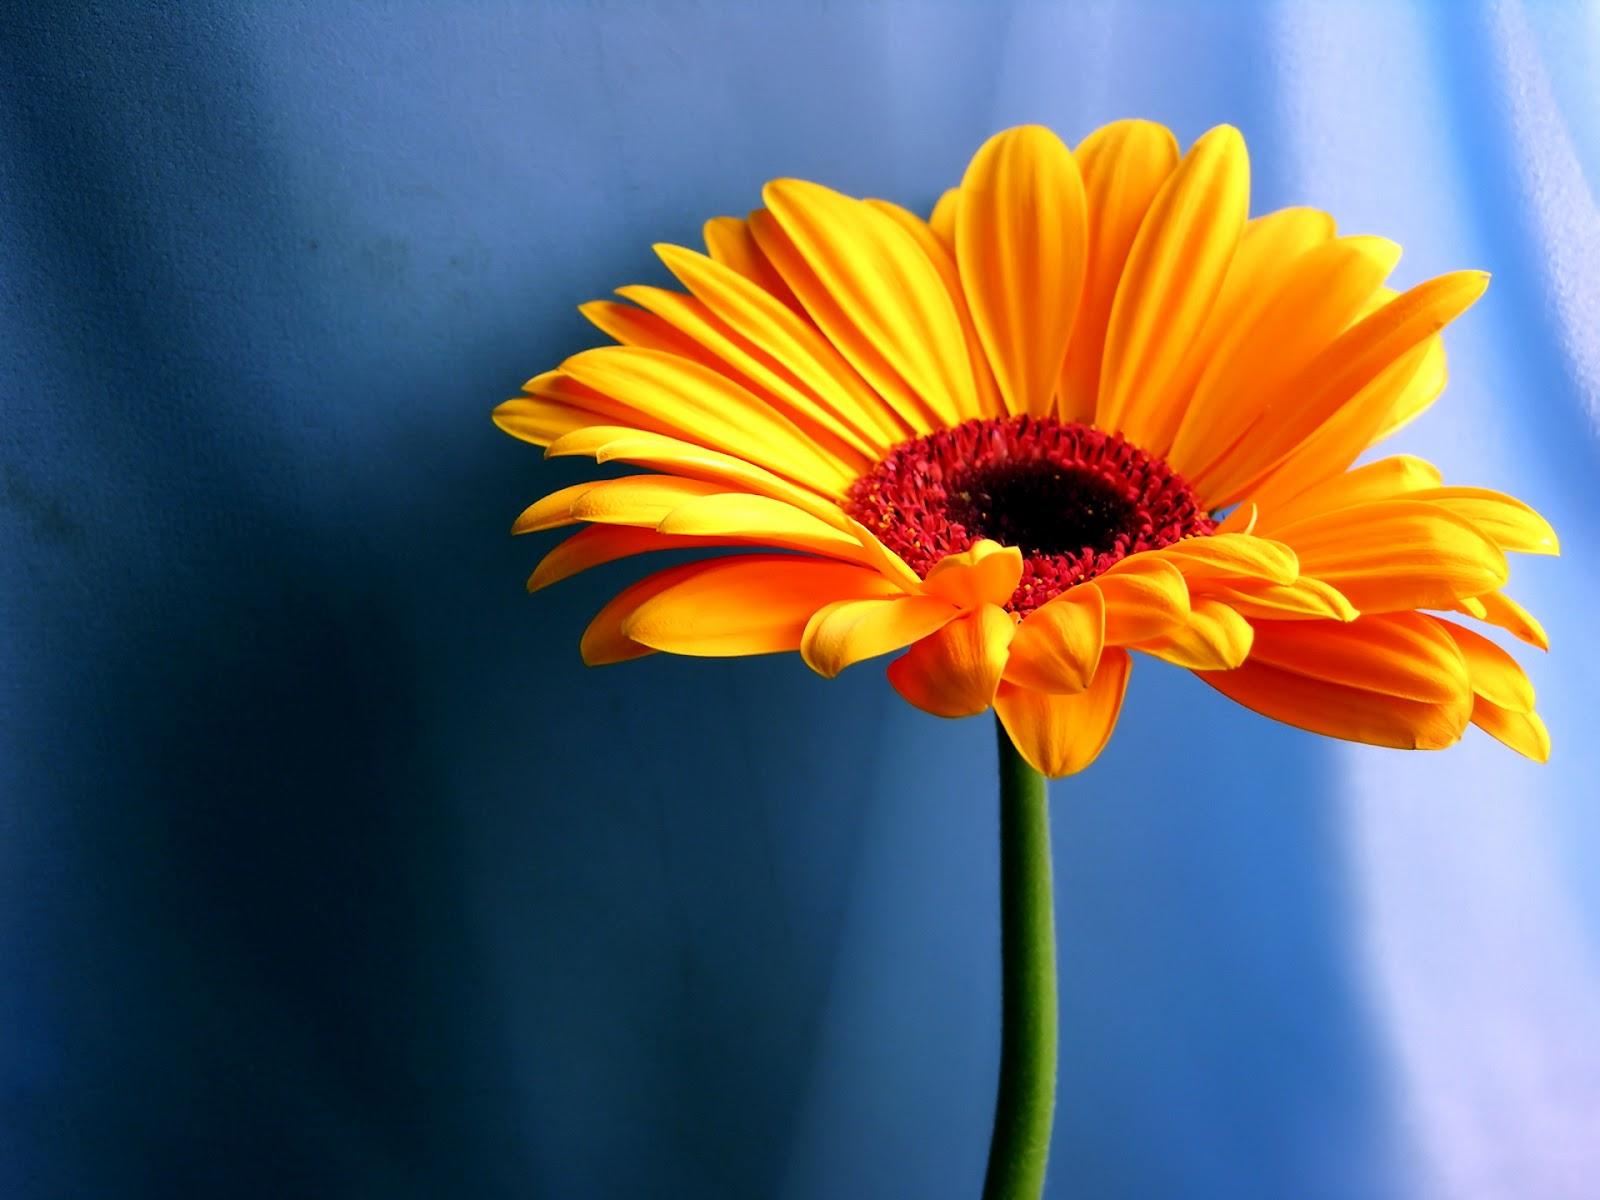 flowers for flower lovers Daisy flowers desktop wallpapers 1600x1200